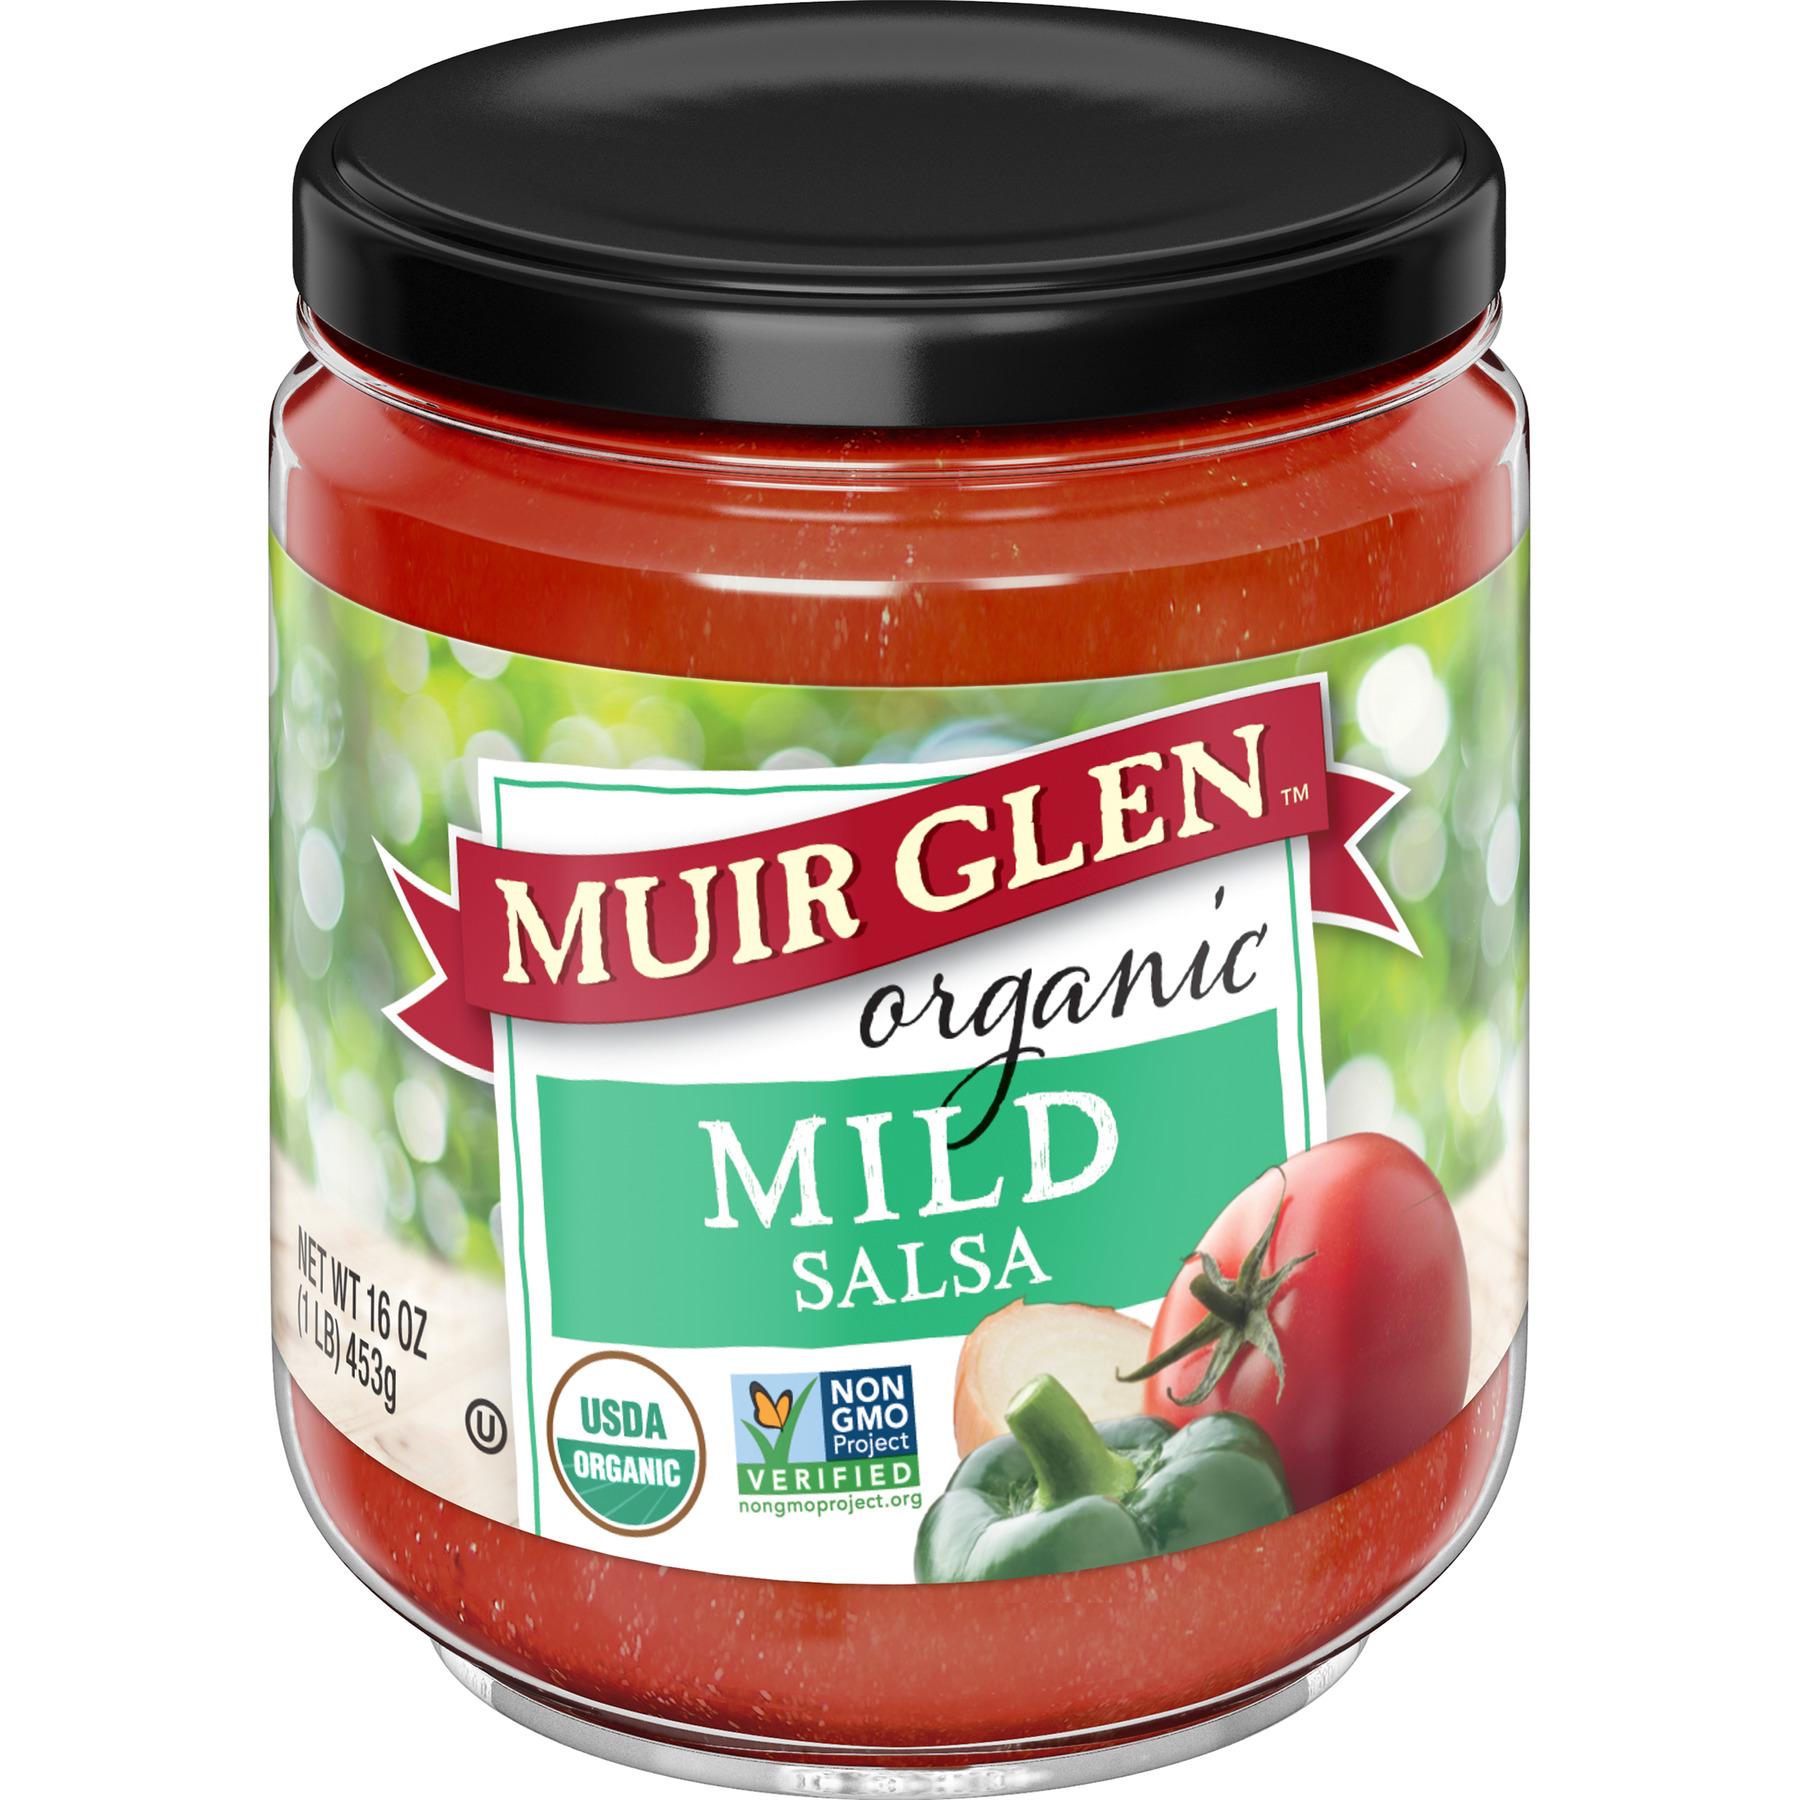 (2 Pack) Muir Glen Organic Mild Salsa, 16 oz Can